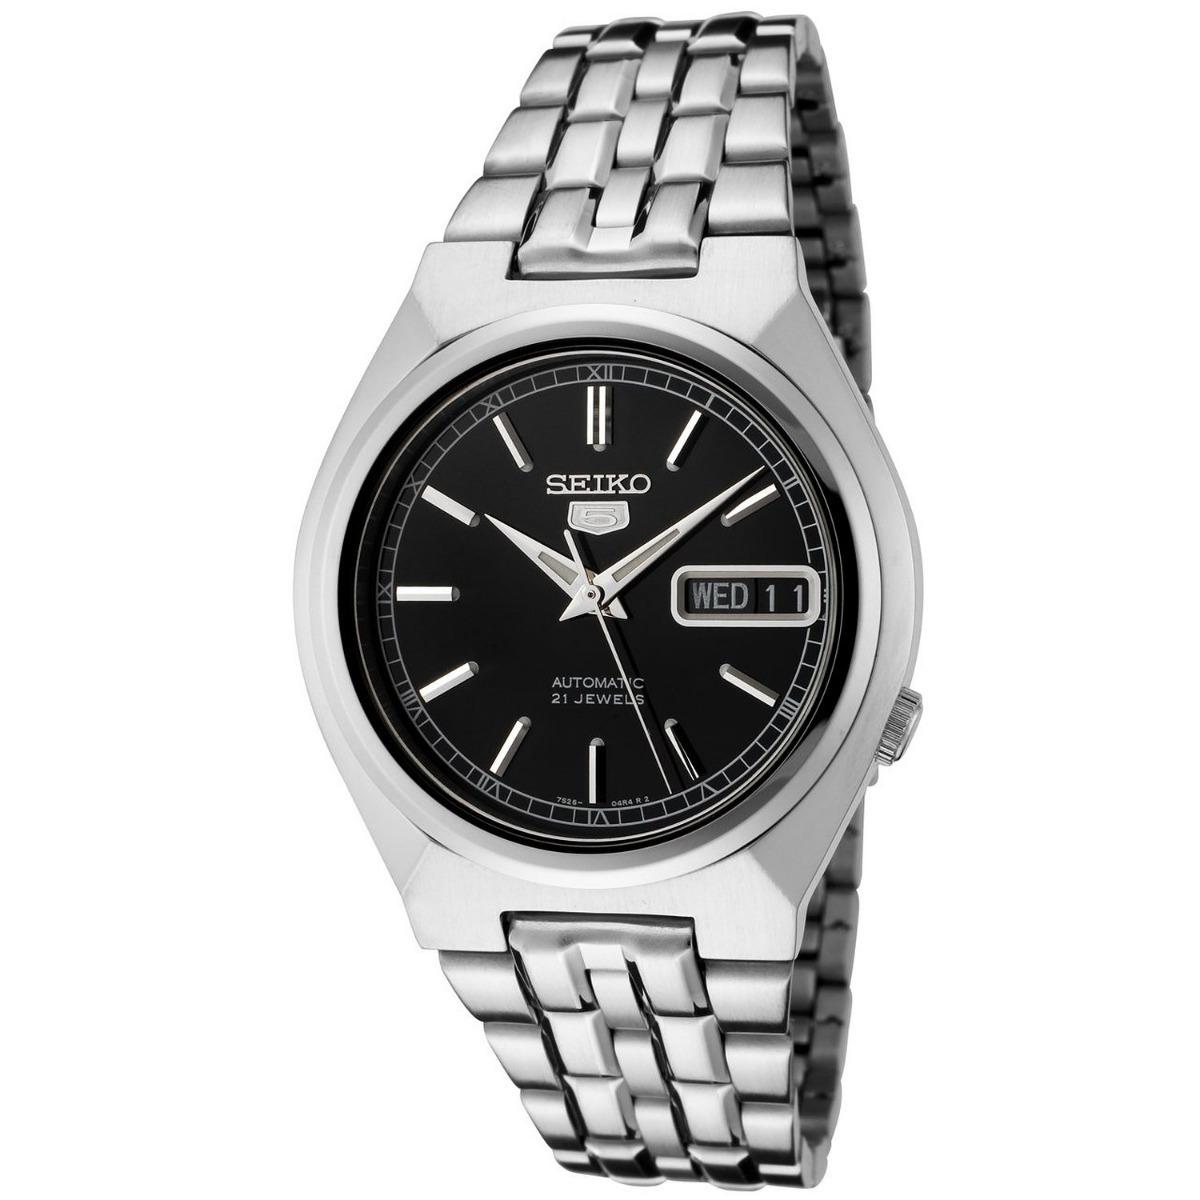 935a51c92764 reloj automatico seiko 5 snk307 hombre acero 21 jewels. Cargando zoom.